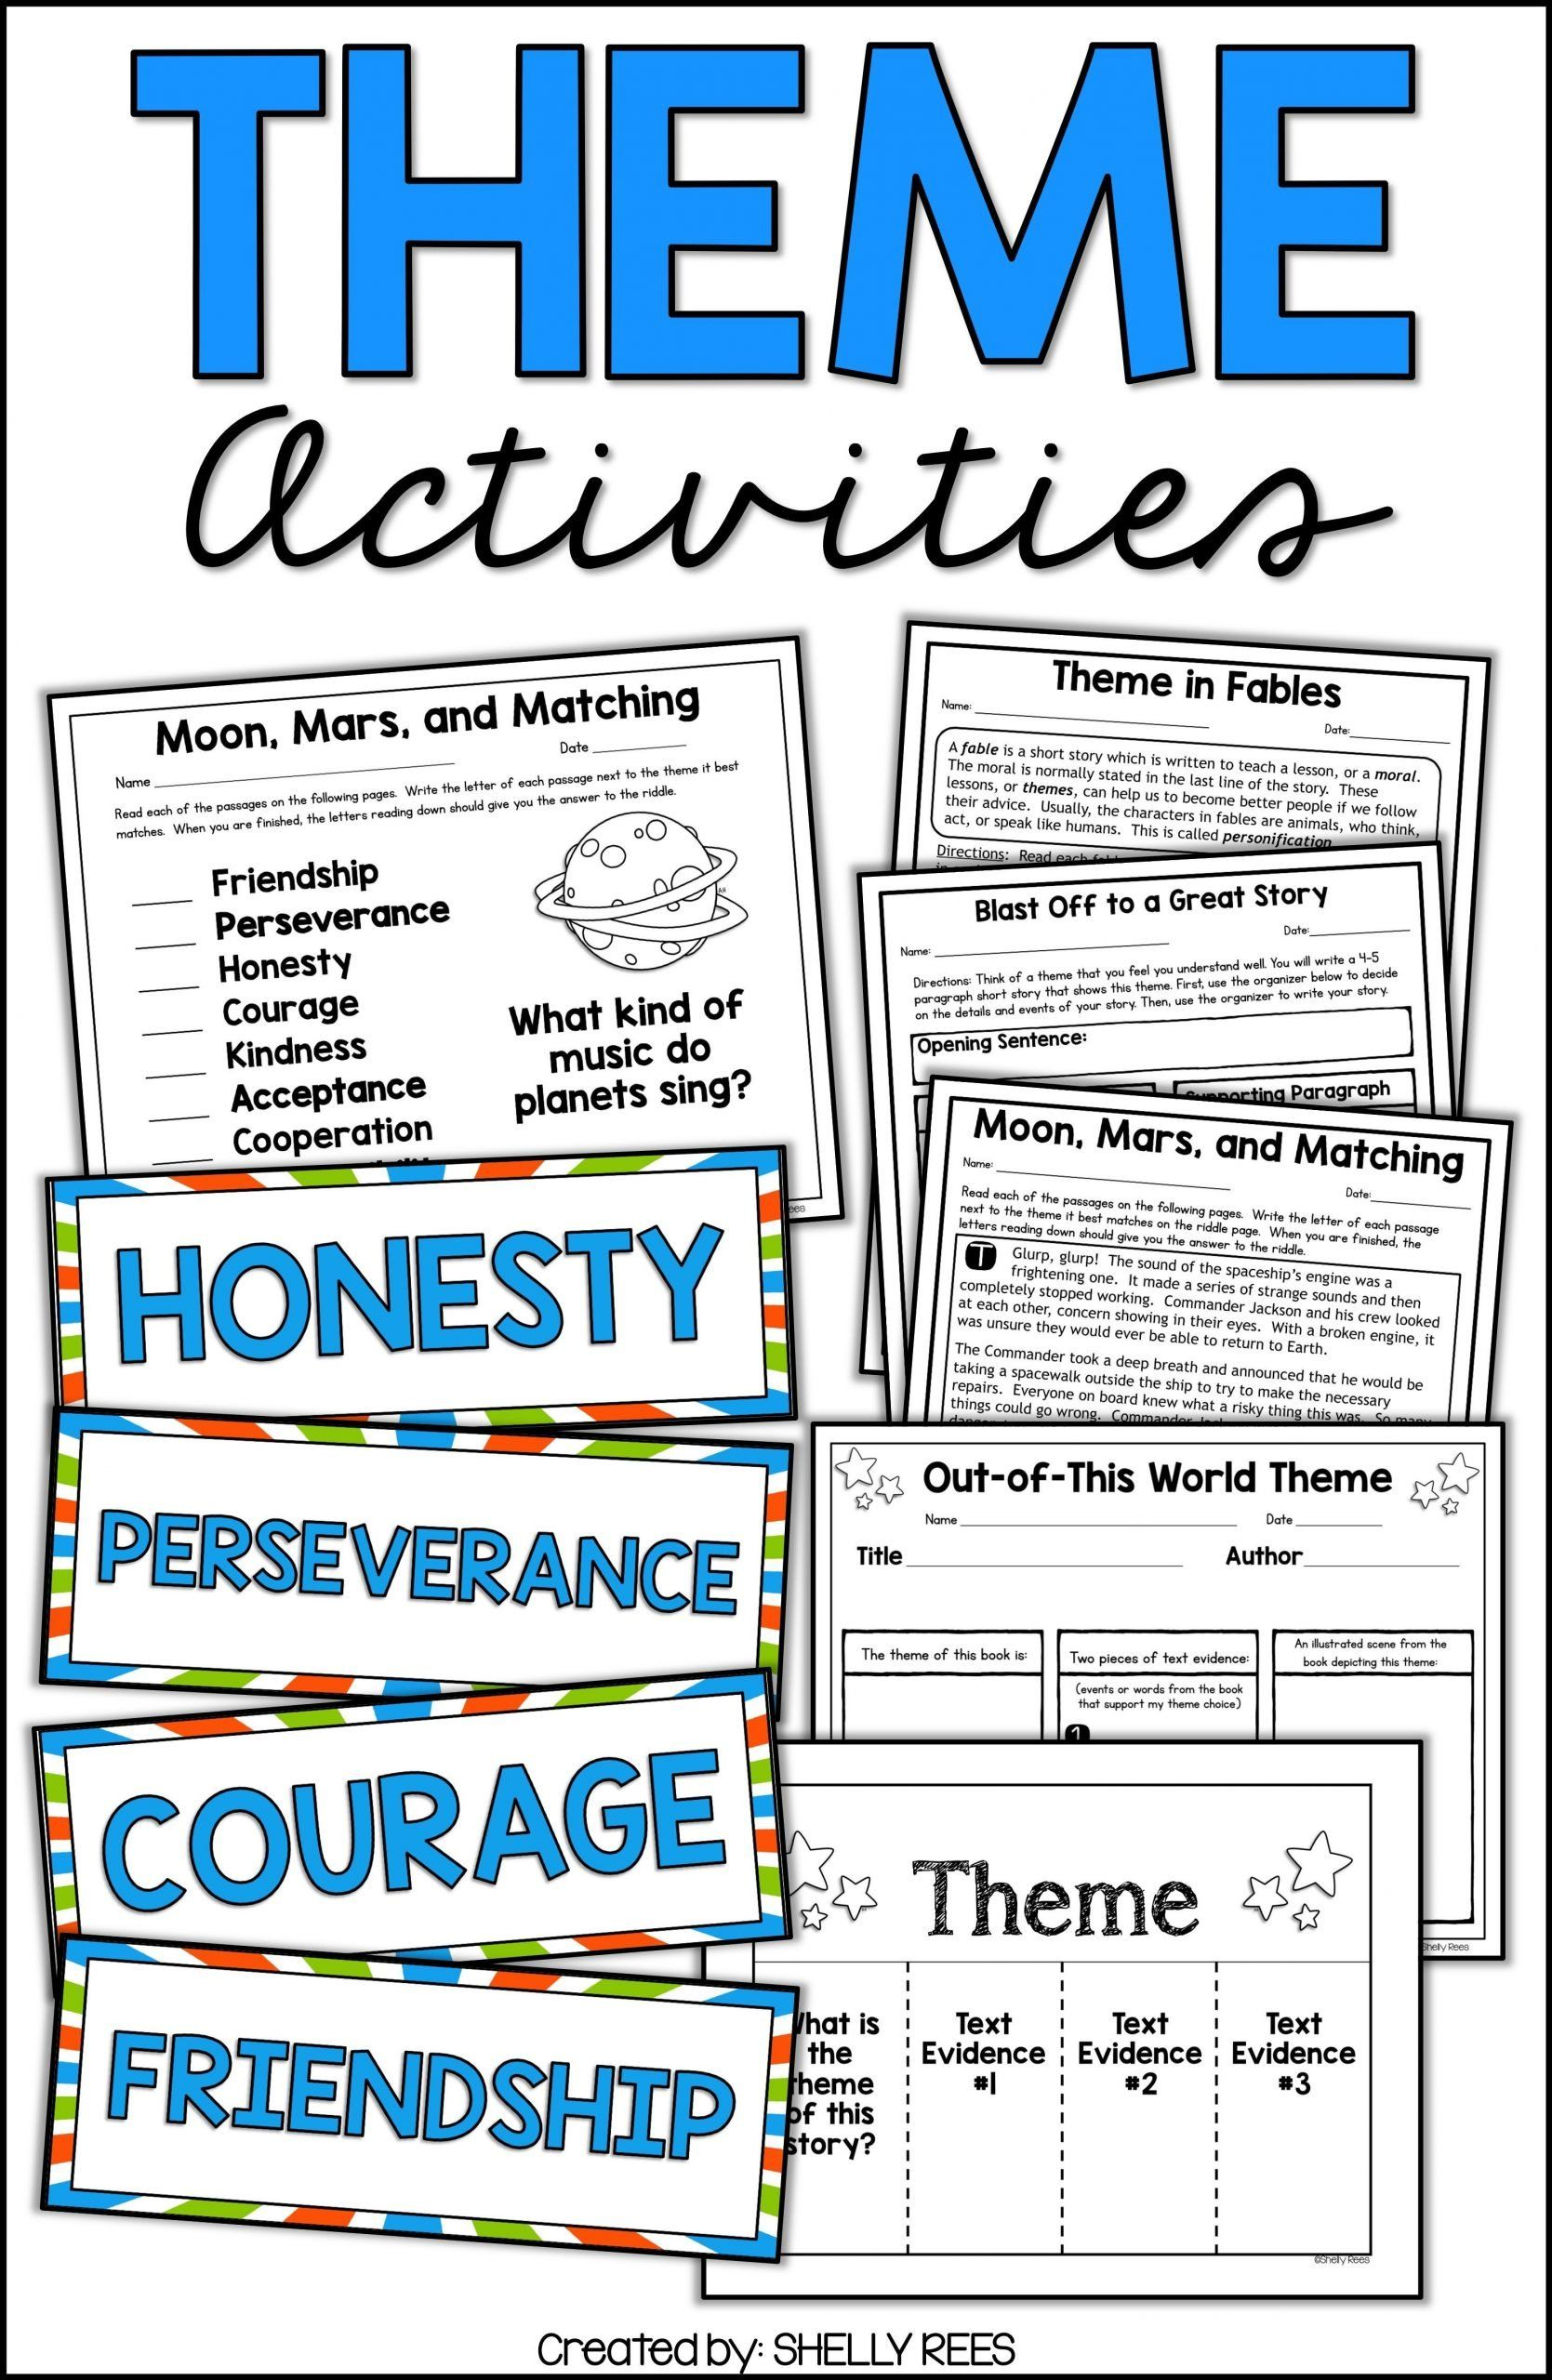 medium resolution of Theme Worksheet 4th Grade theme and Teaching theme   Teaching themes